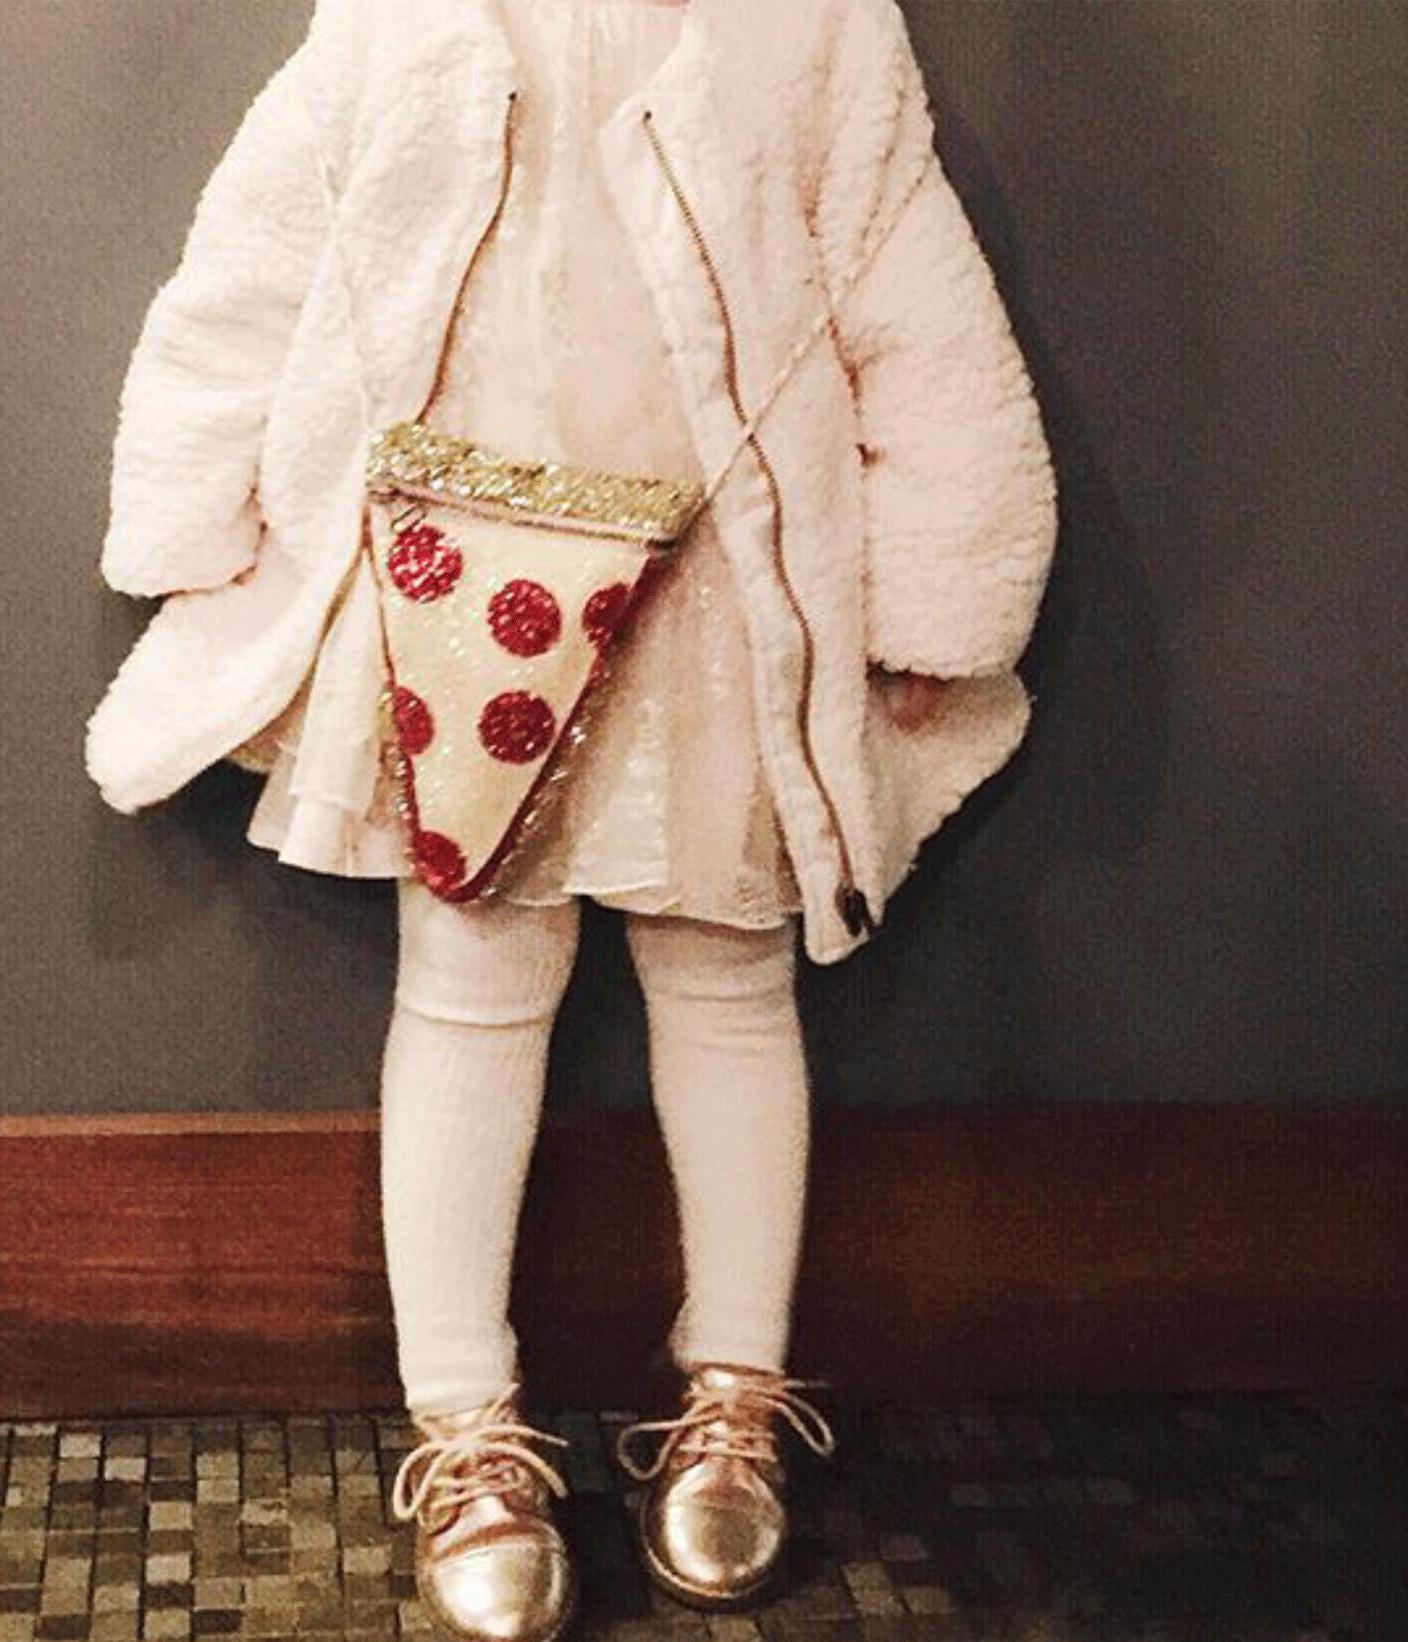 pizza bag via glitter guide on instagram | @themissprints